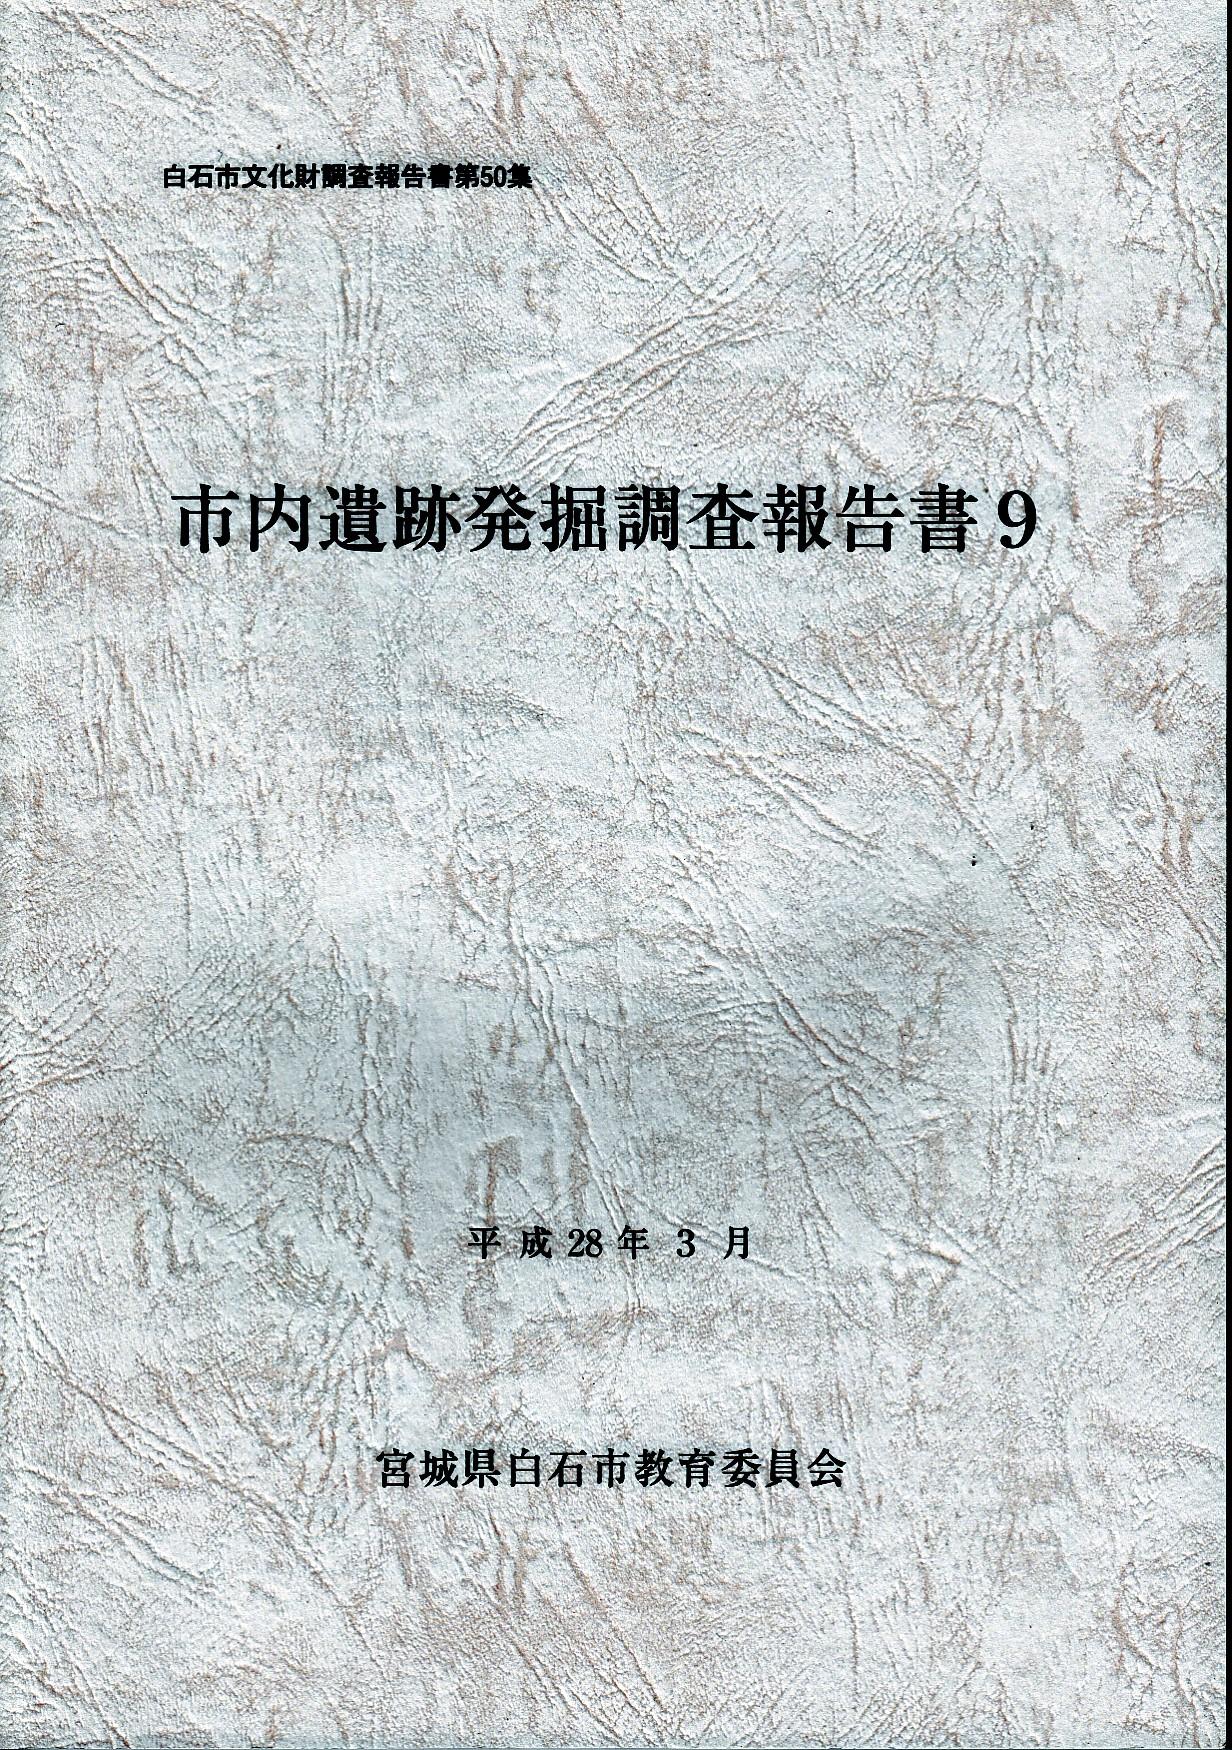 No-0221